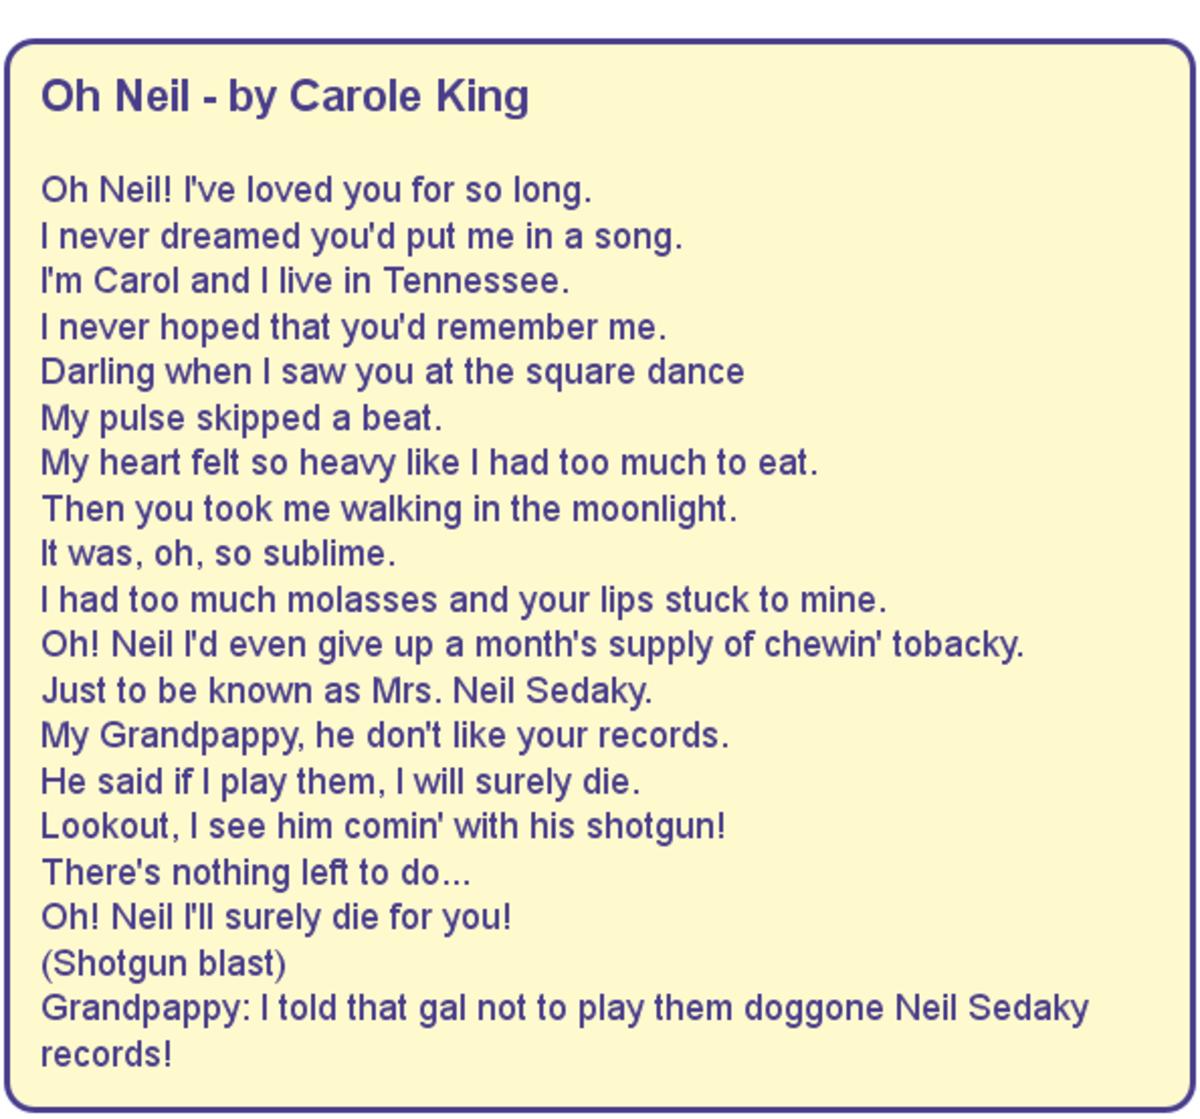 Oh Neil - Lyrics by Carole King